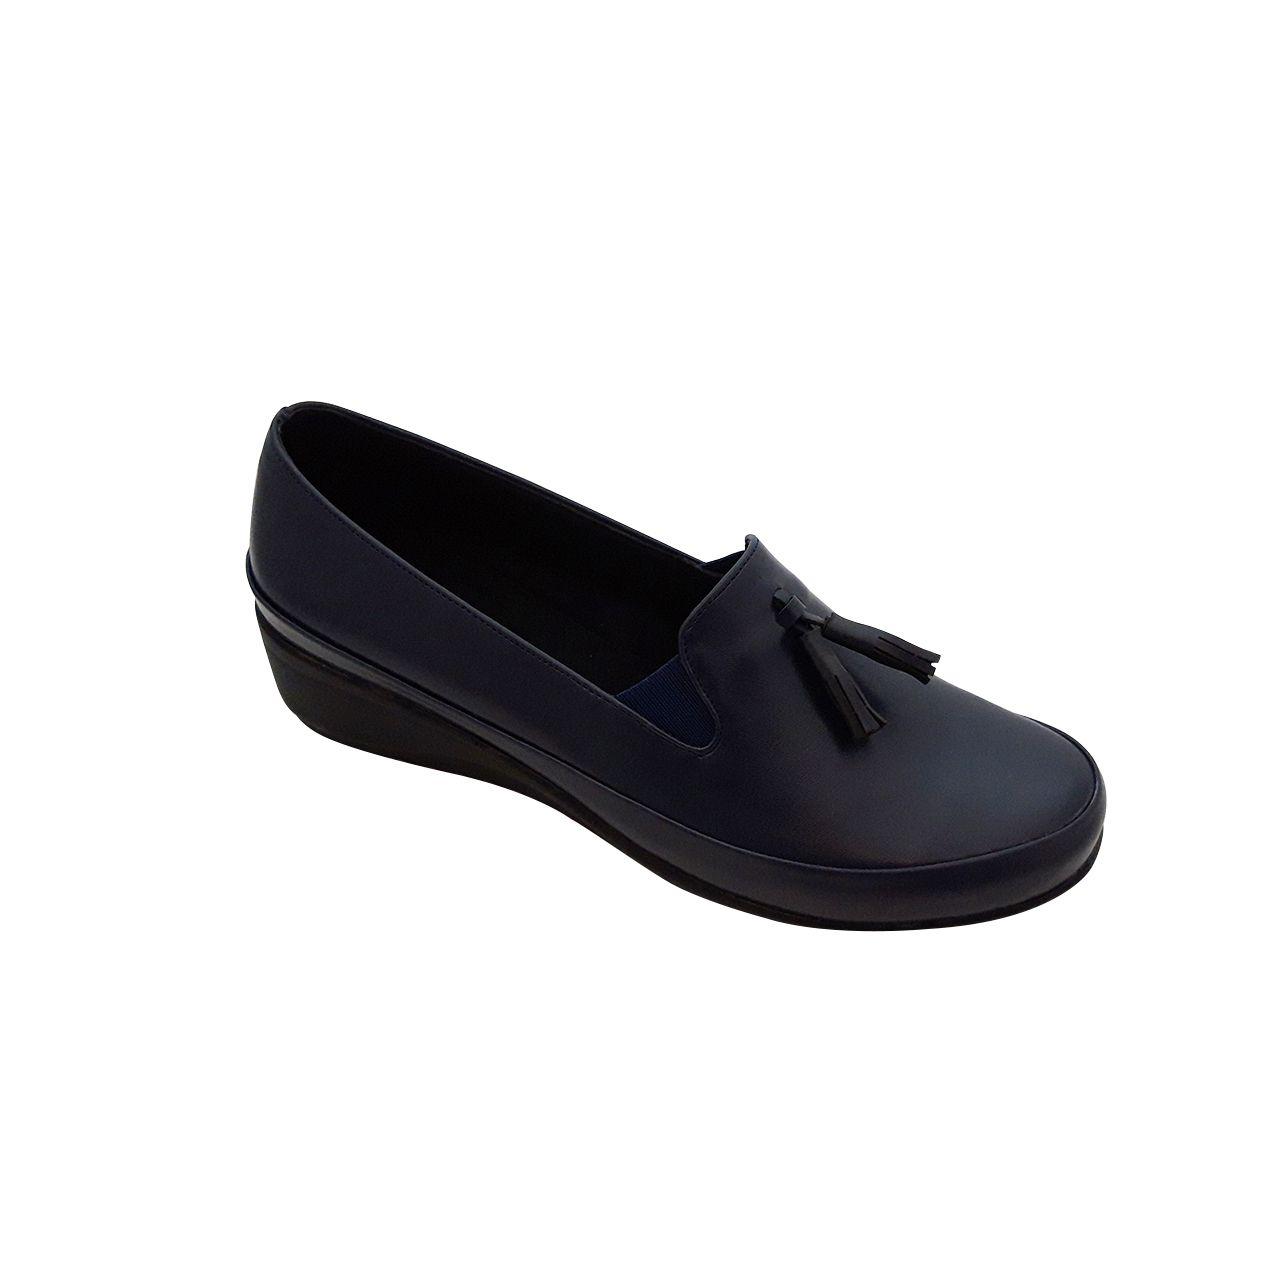 کفش زنانه پاتکان کد 615 کد 01 -  - 3